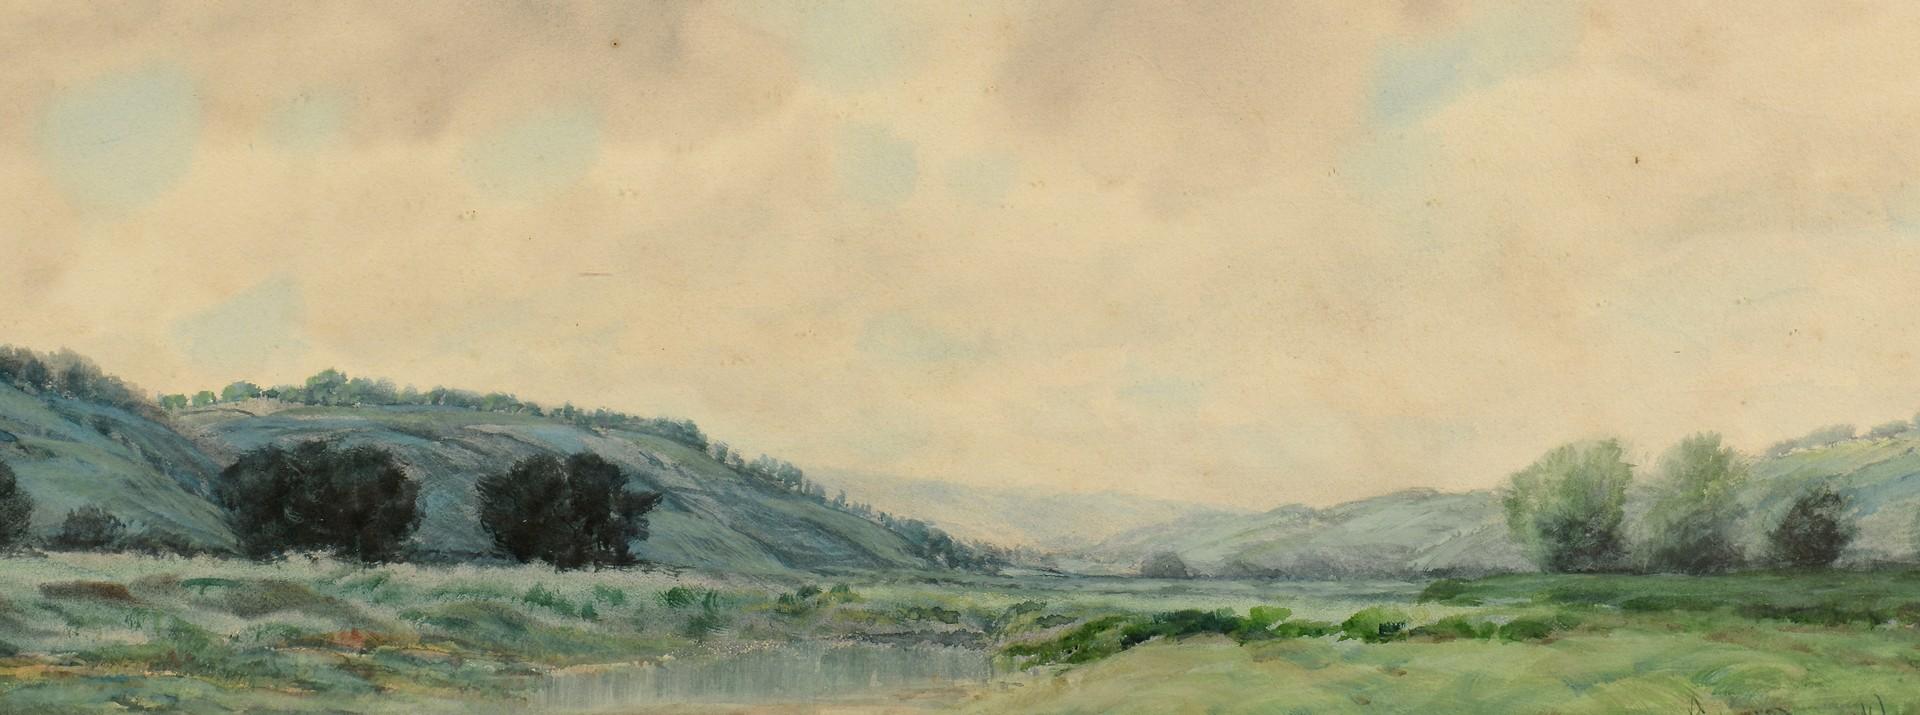 Lot 654: Kentucky, Robert Burns Wilson Watercolor